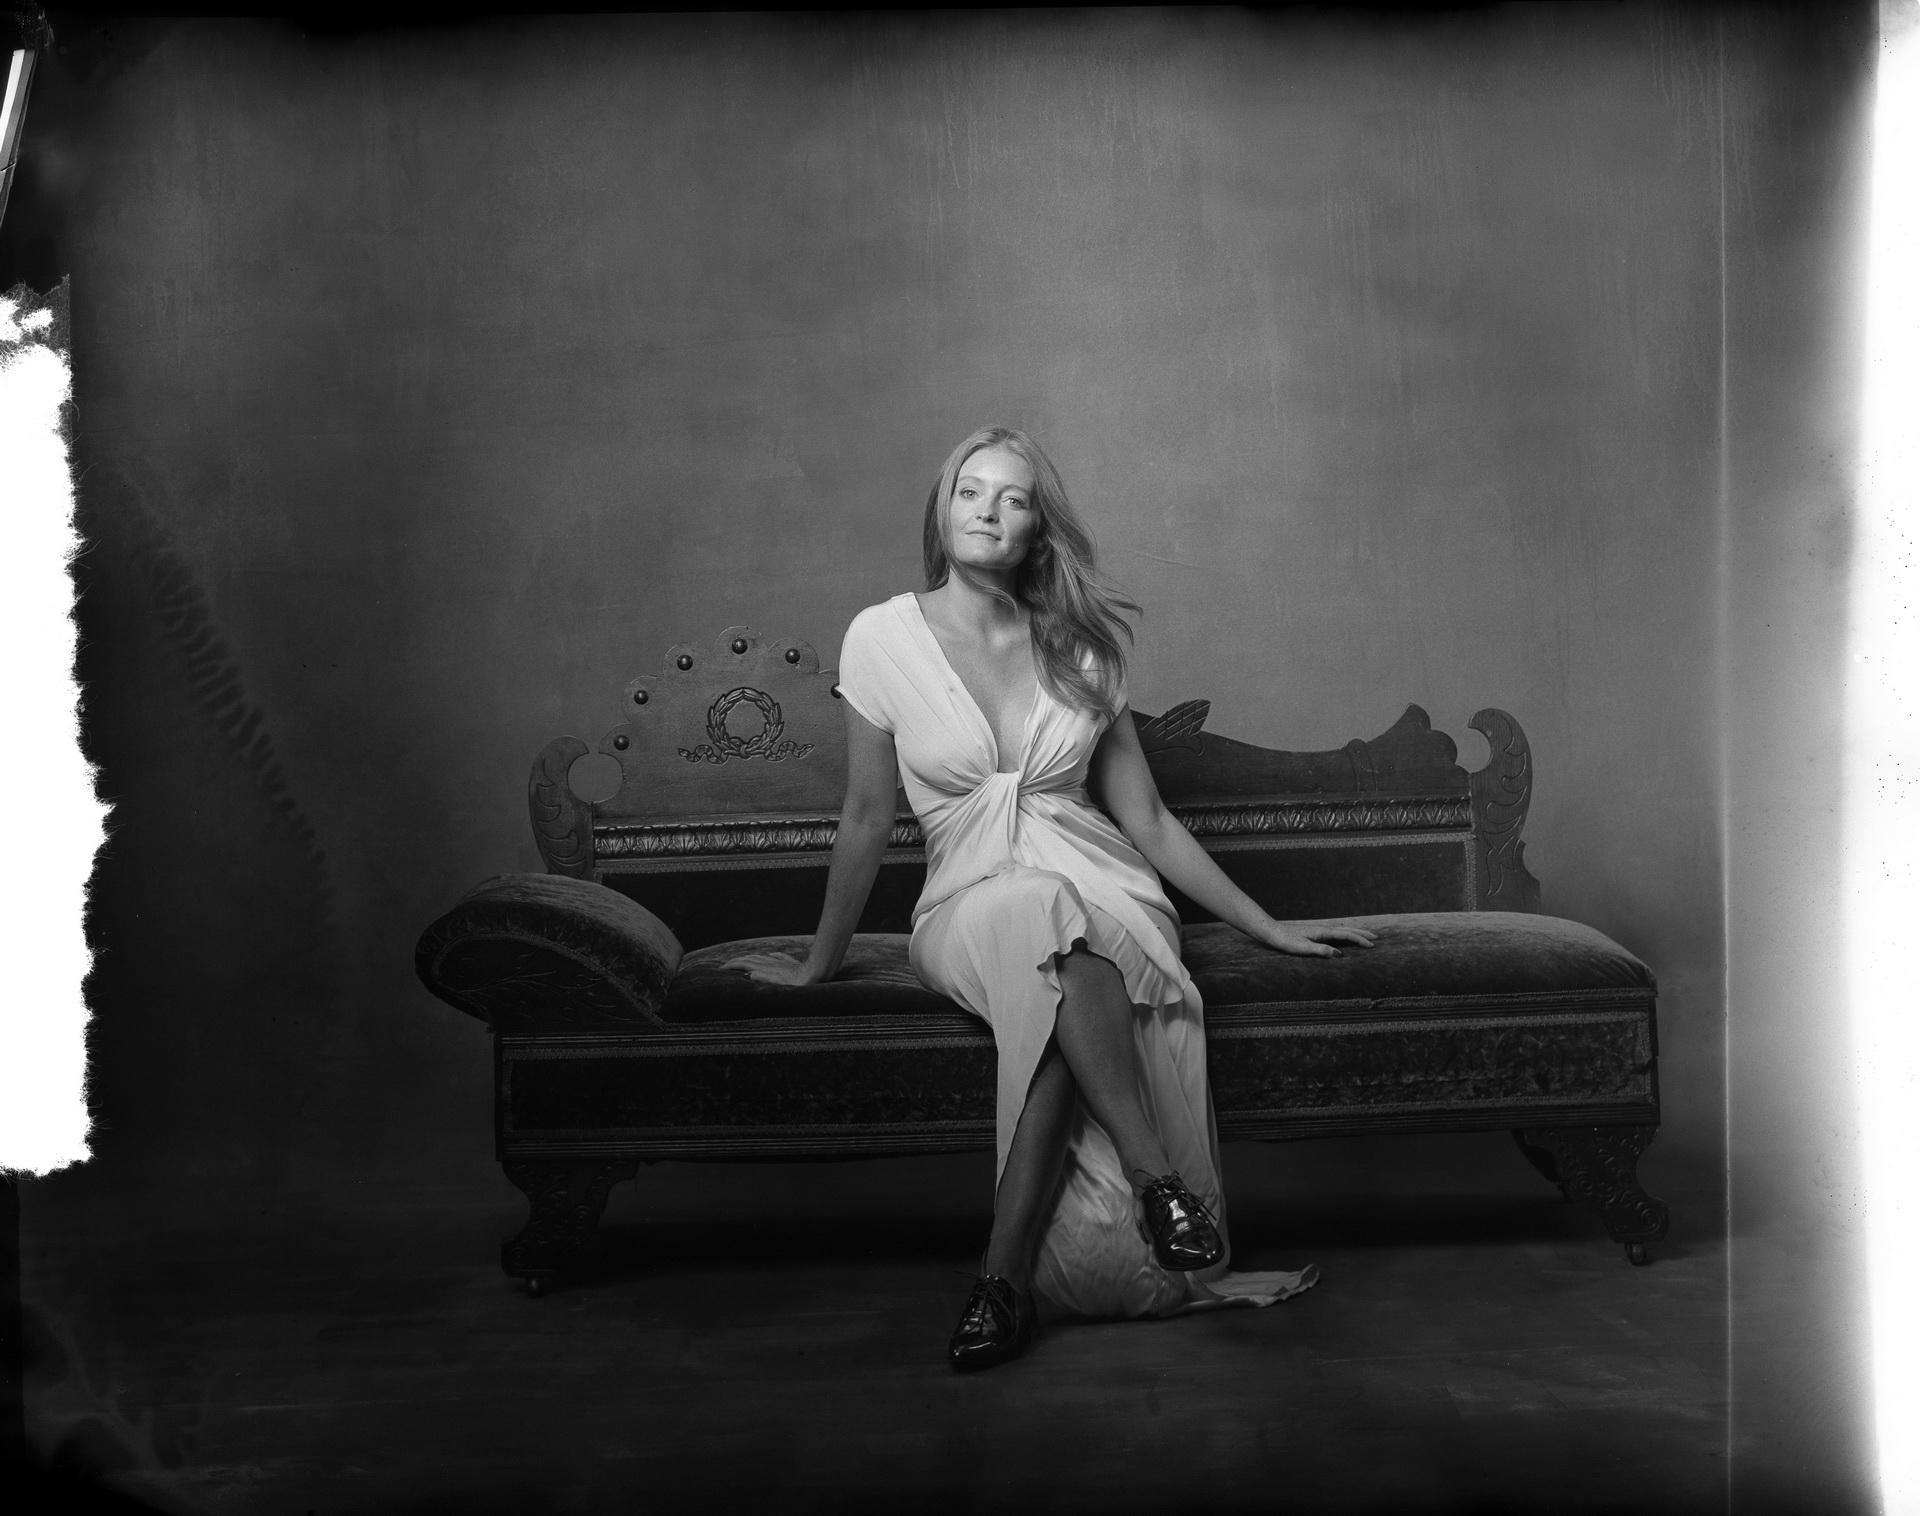 new 55 film photo studio portrait of woman